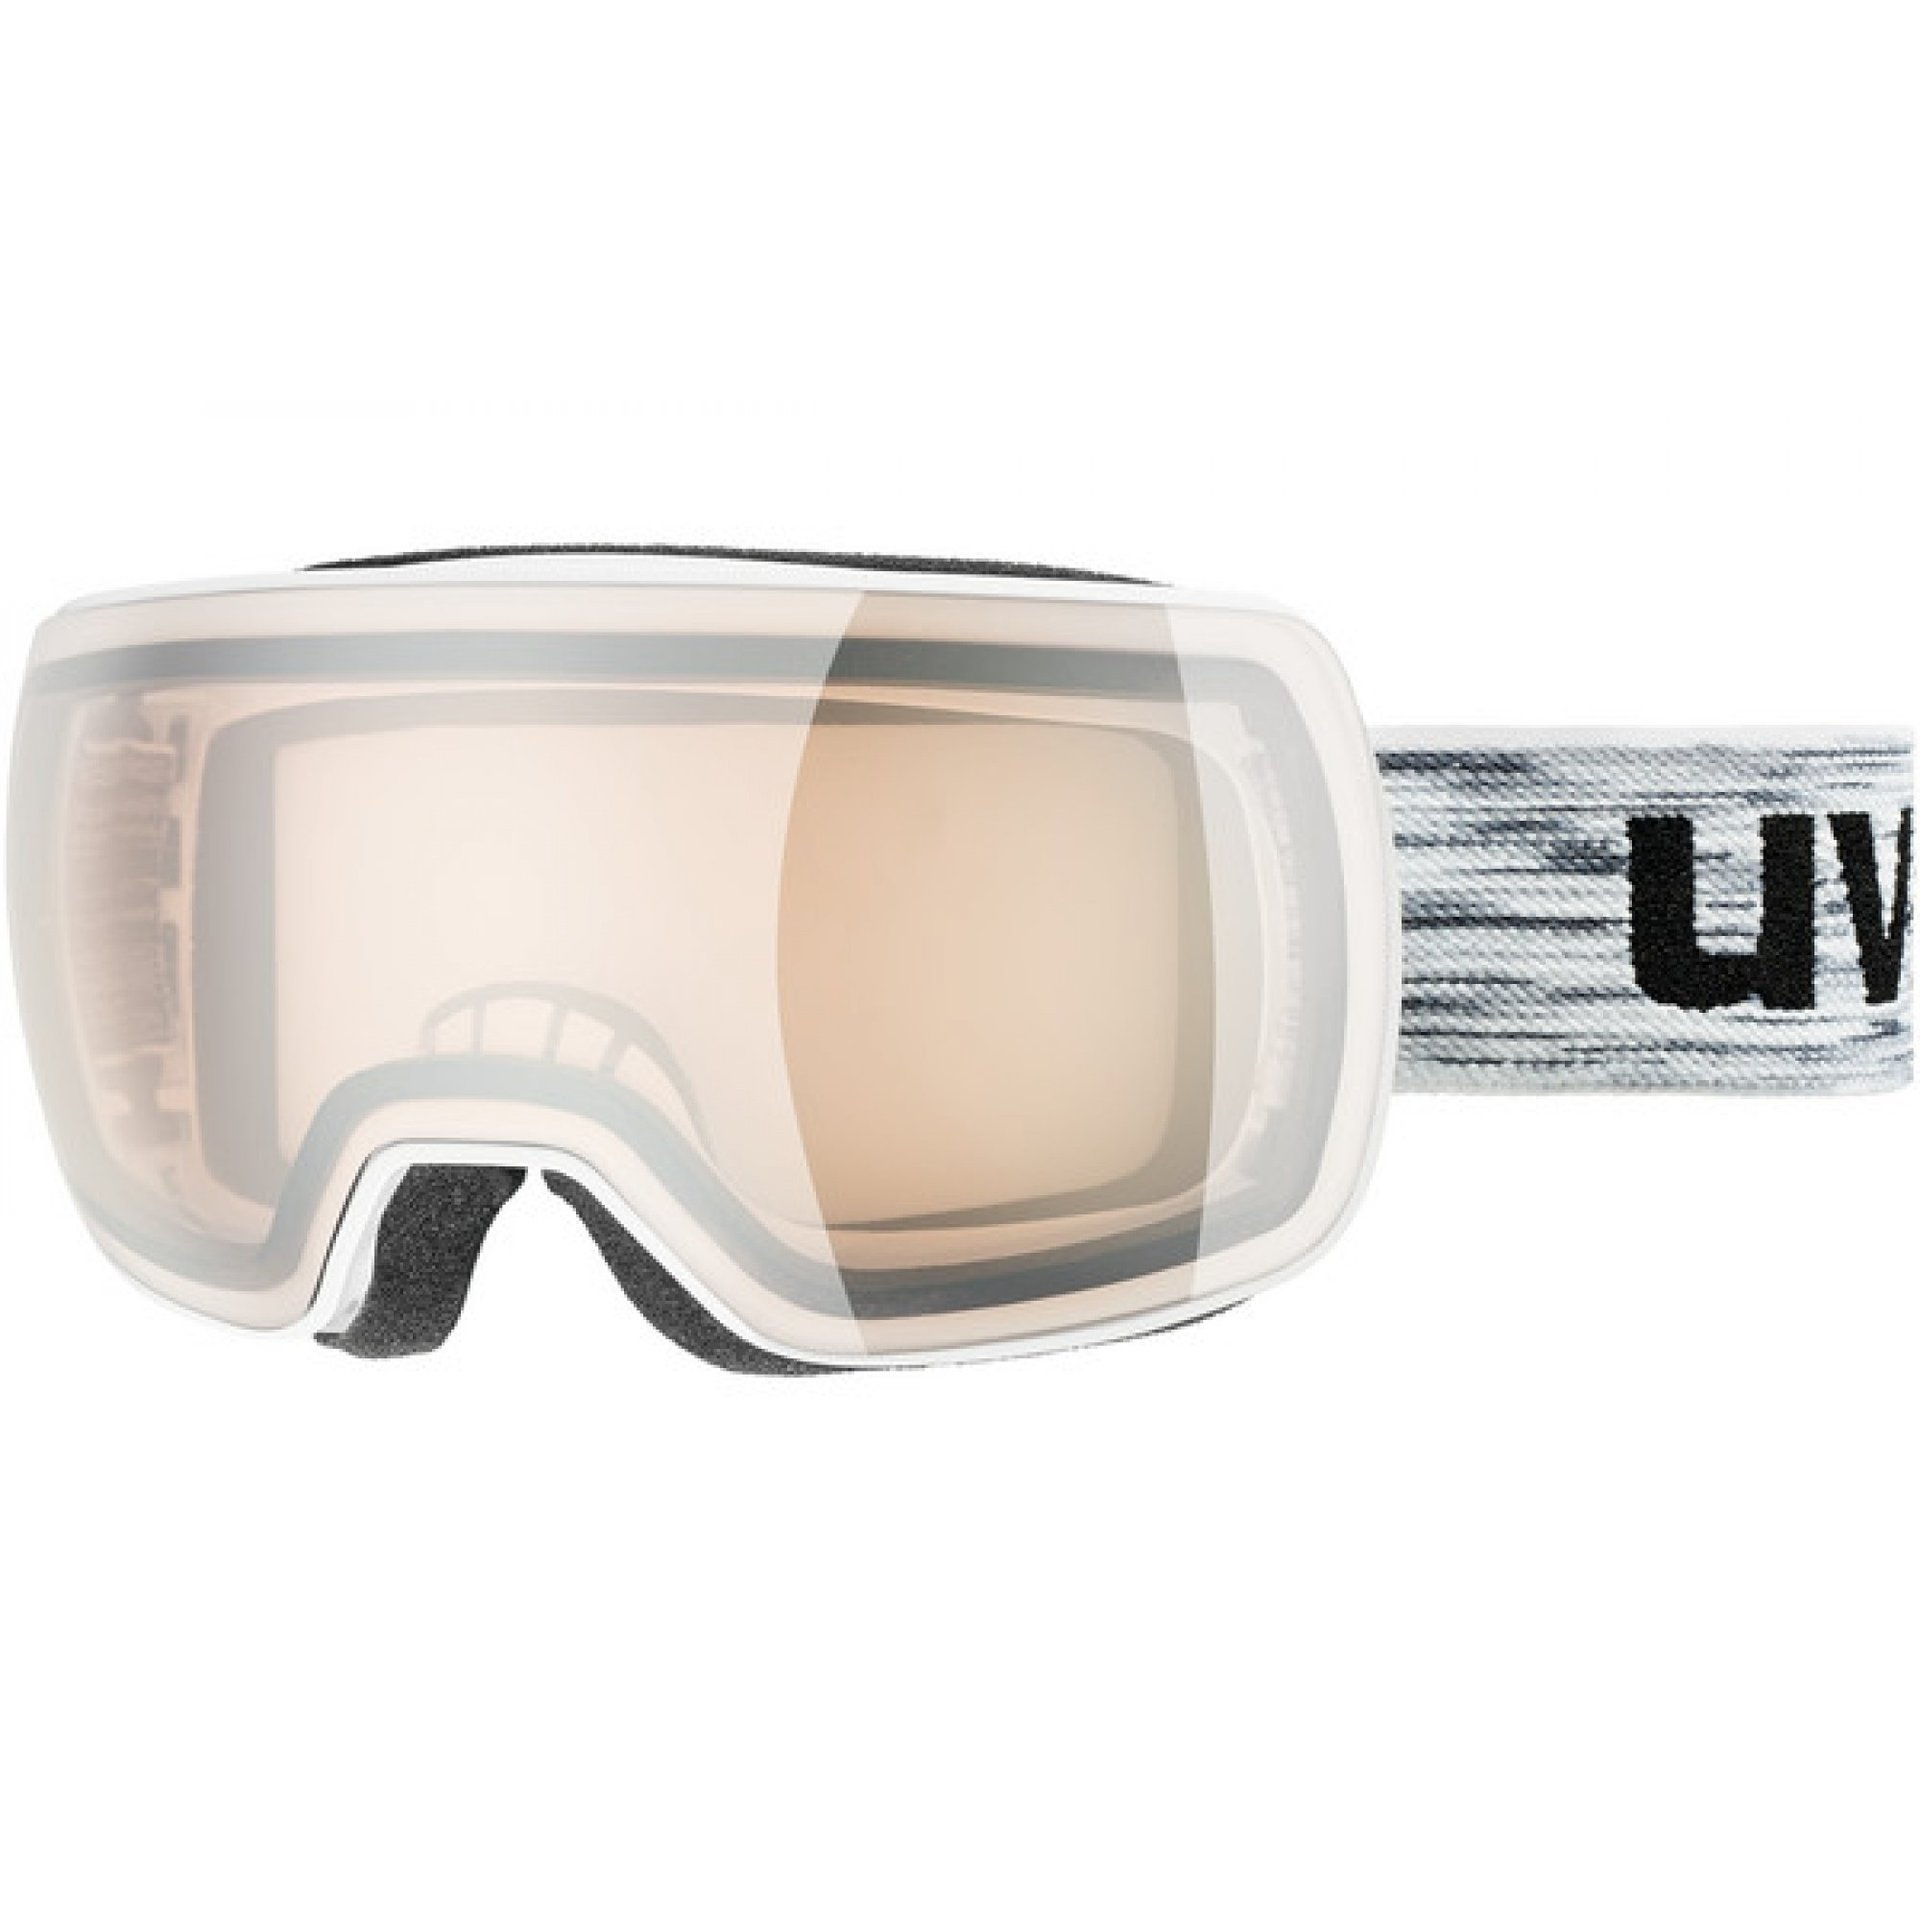 GOGLE UVEX COMPACT VLM WHITE|LITEMIRROR SILVER VARIOMATIC S1-3